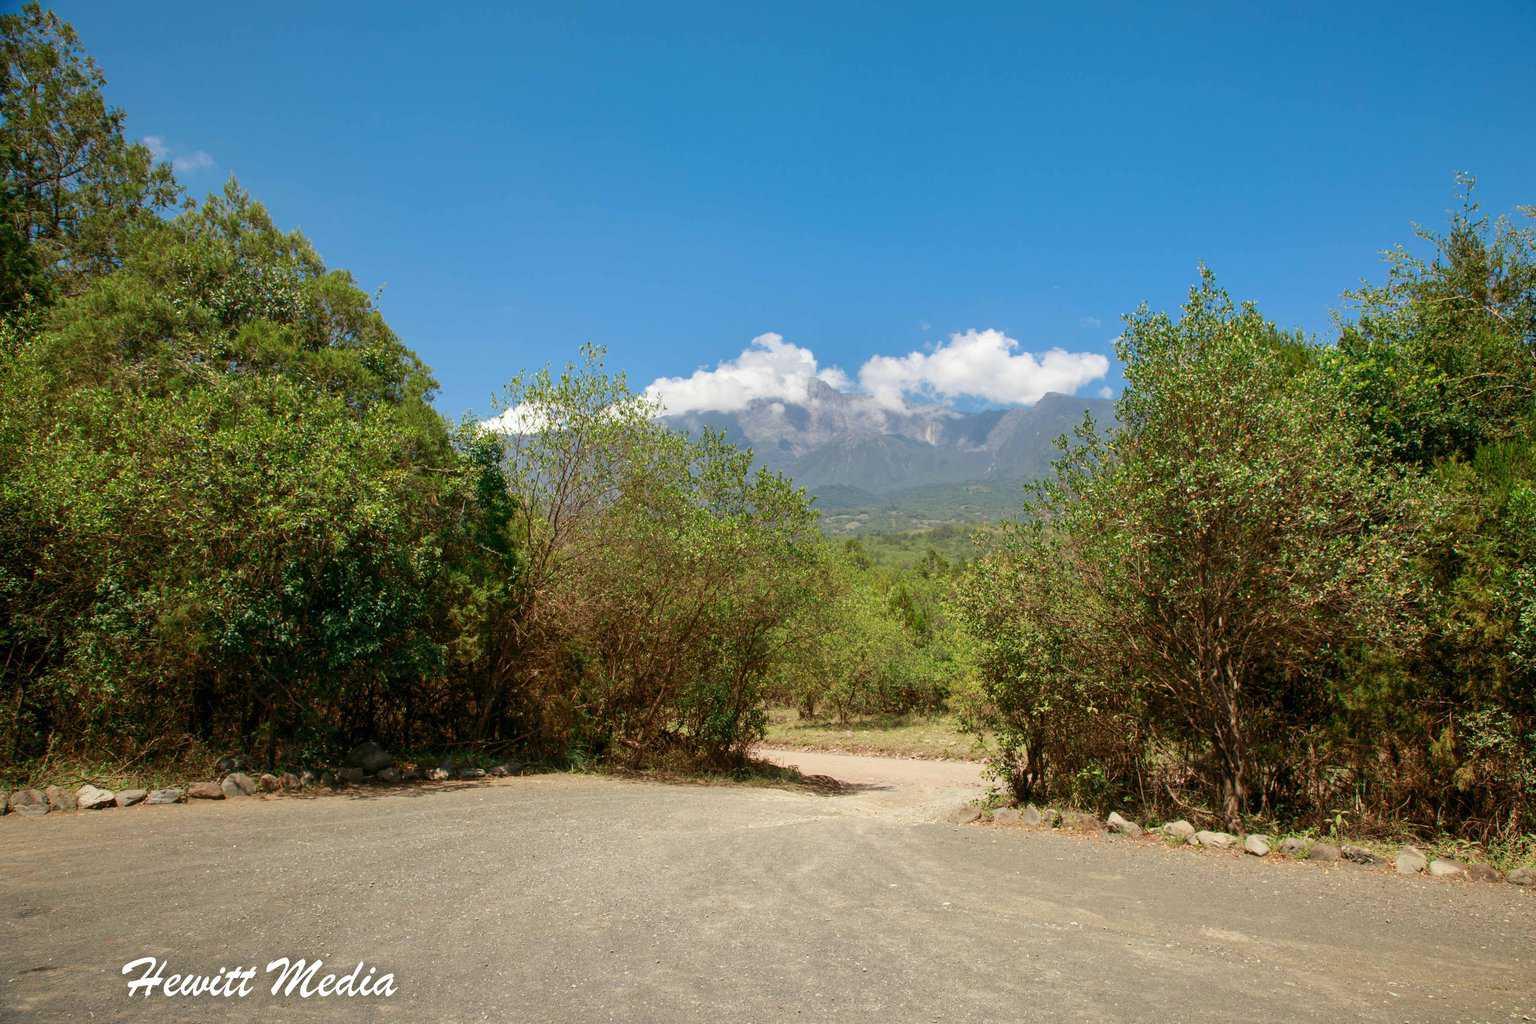 The road thru Arusha National Park